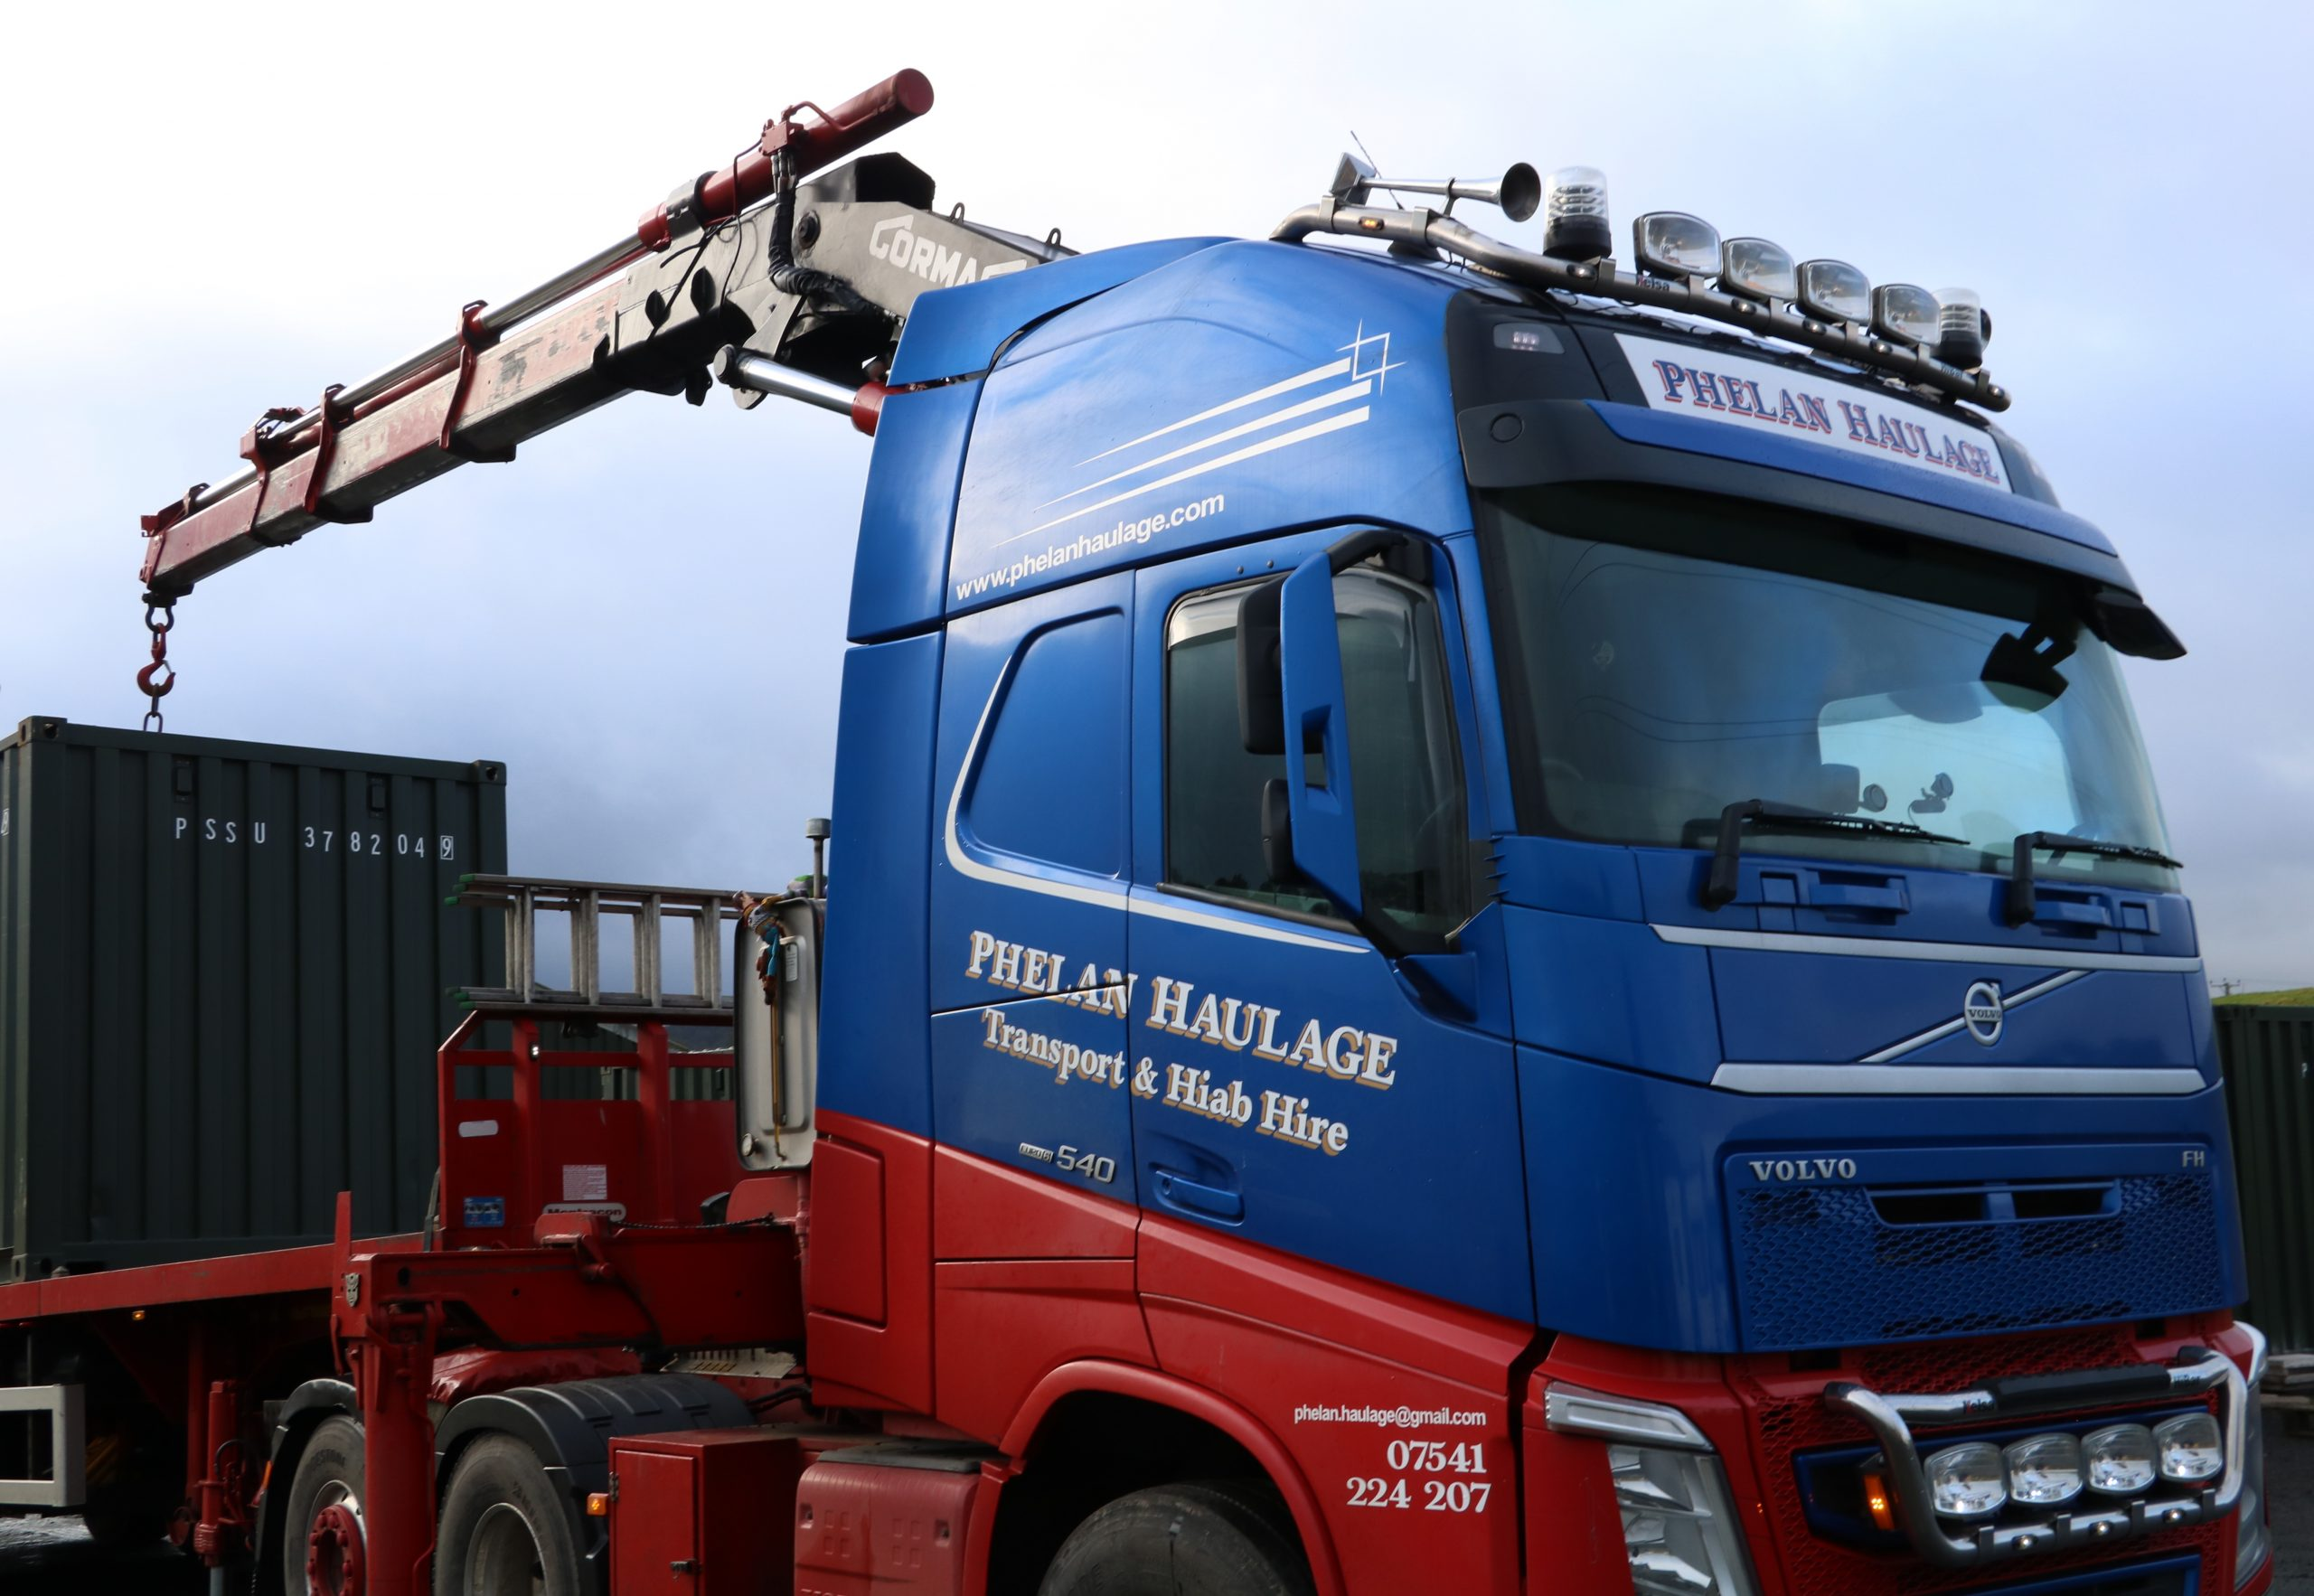 phelan_haulage_hiab_services_hire_truck45